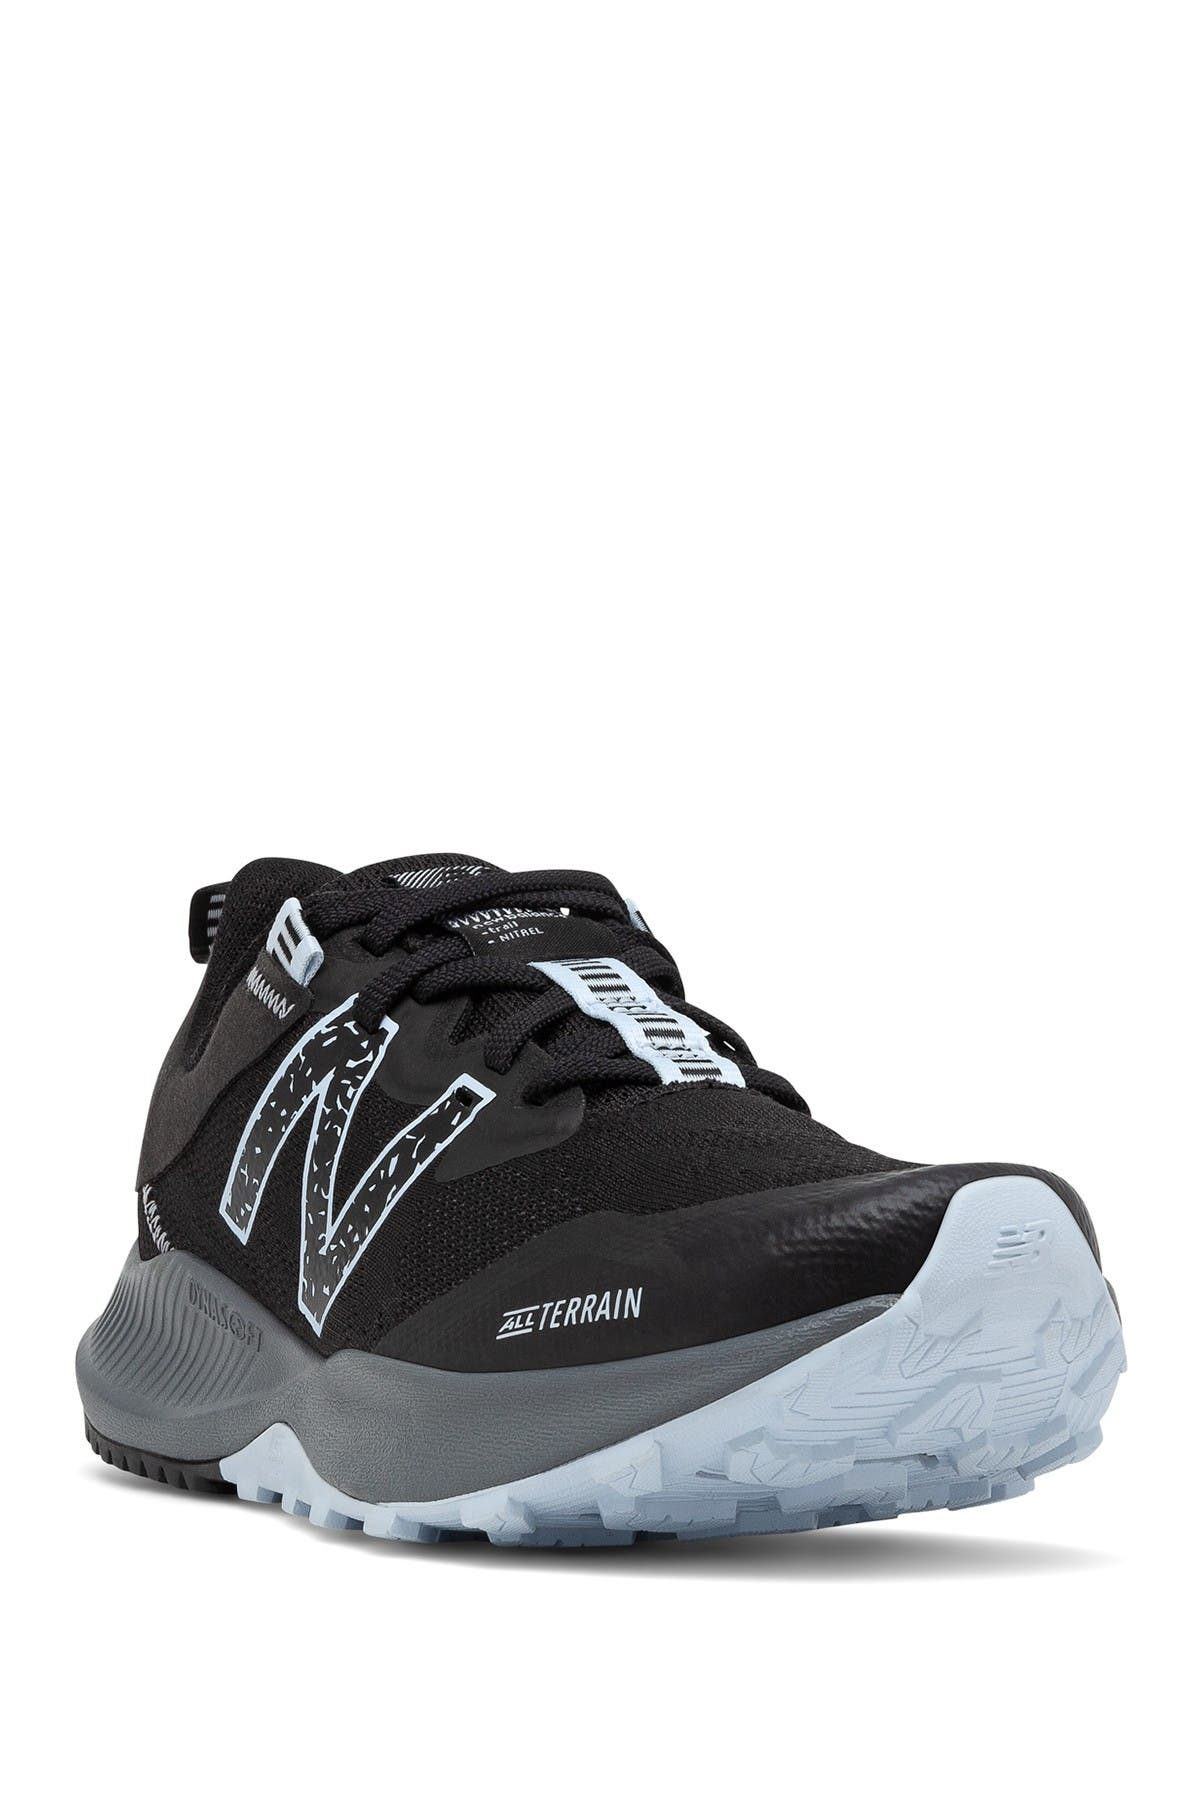 Image of New Balance Nitrel V4 Trail Running Shoe